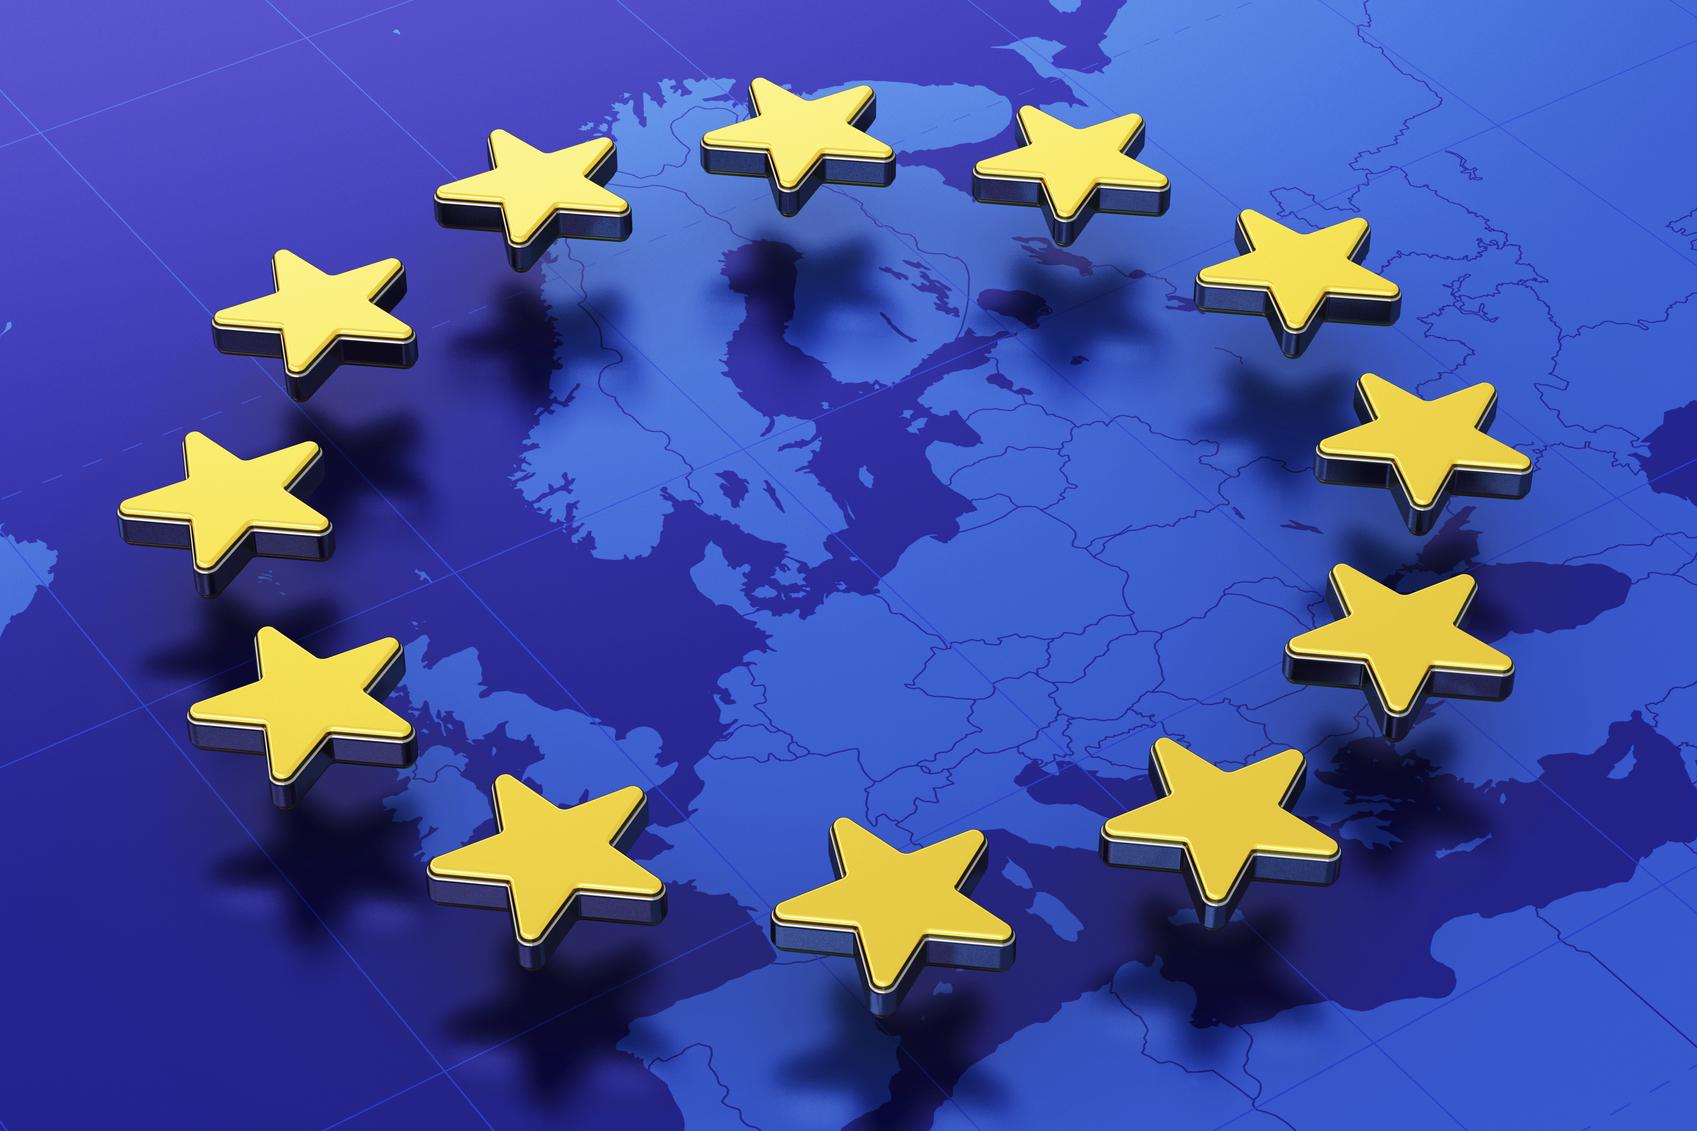 bandiera europea e cartina europea